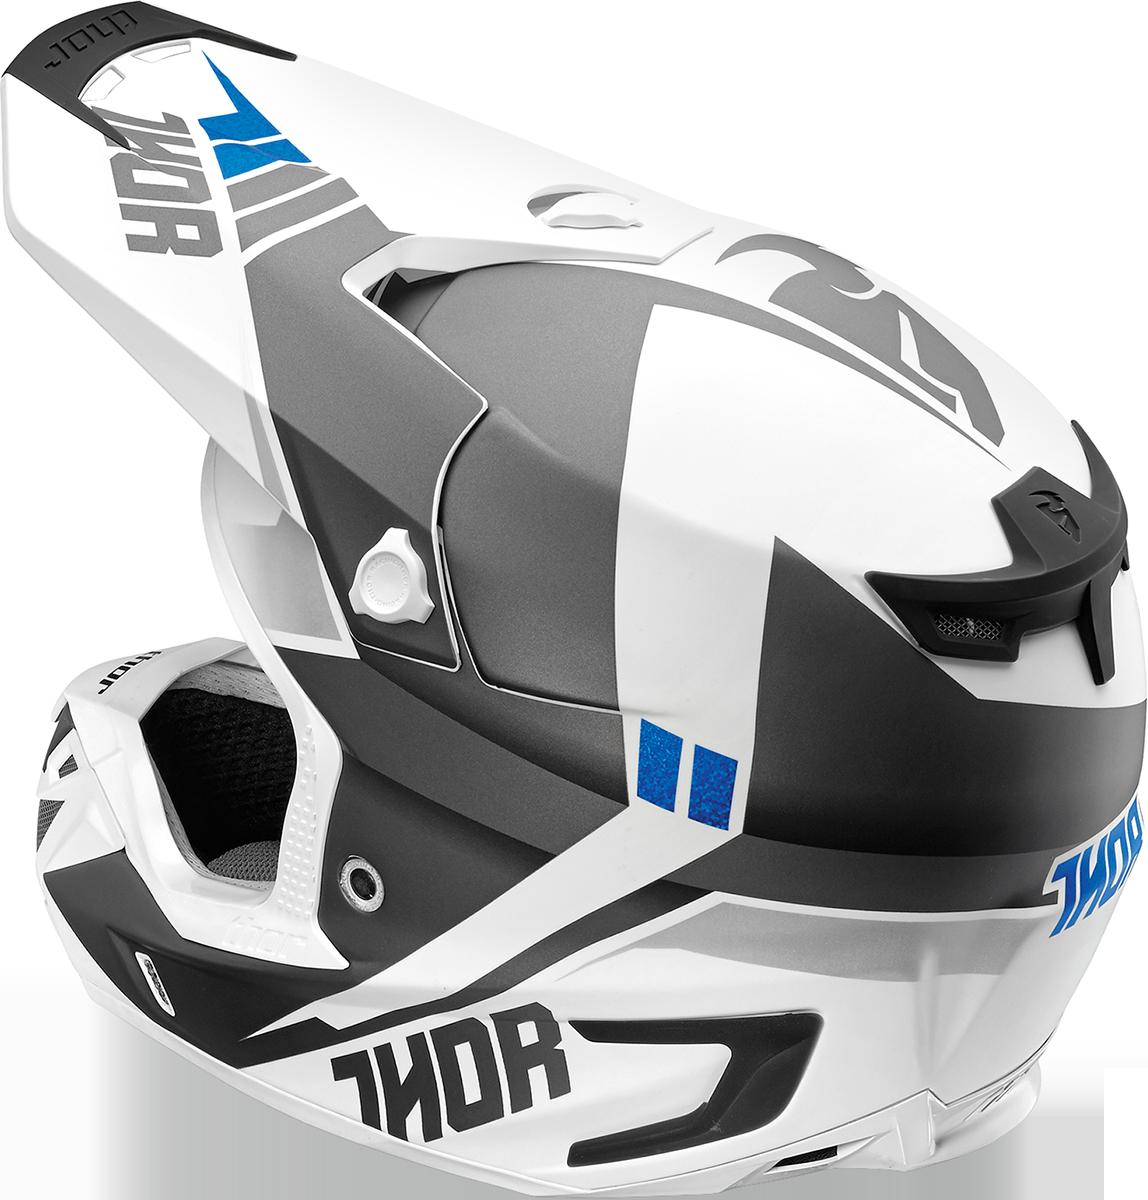 Mx verge motocross rebound. Thor helmet png